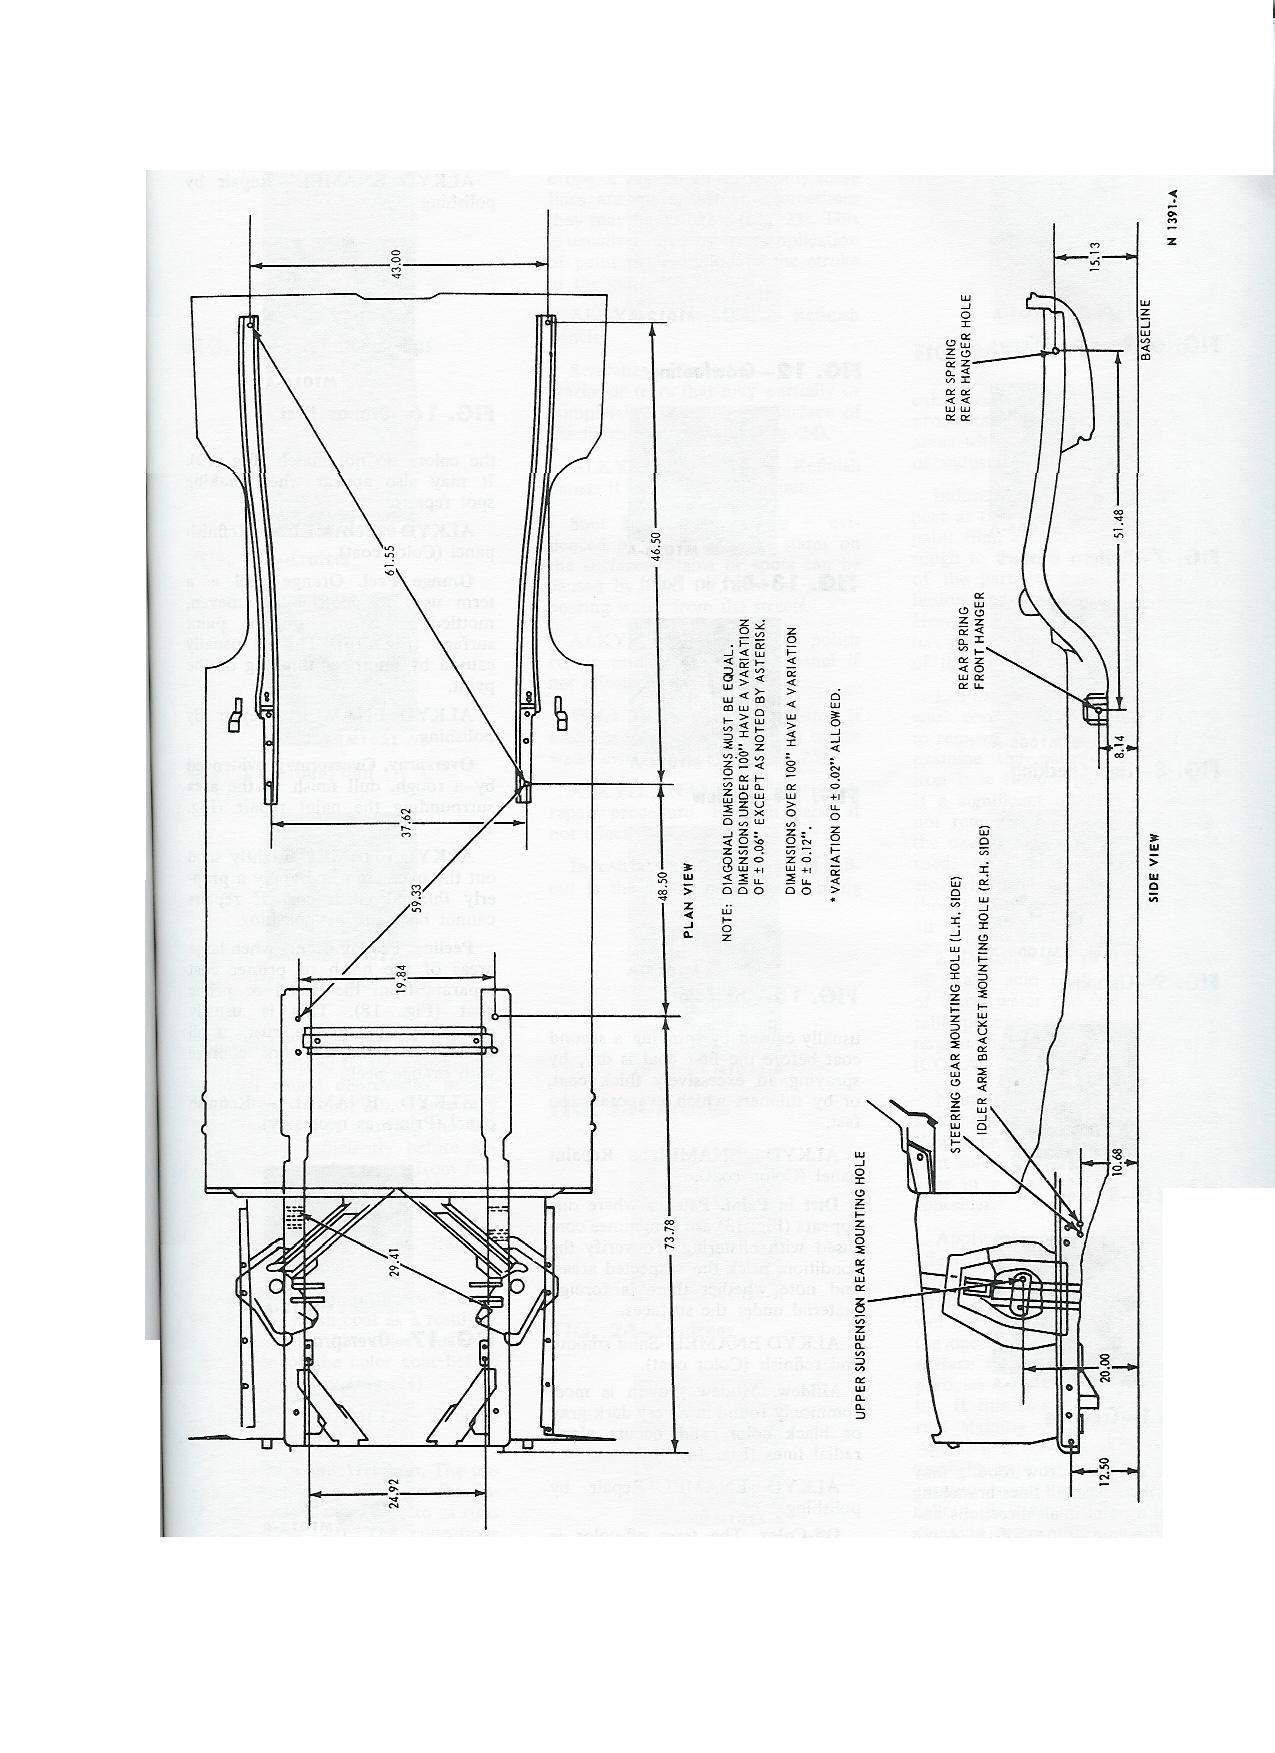 1965 Mustang Specs Or Blueprints